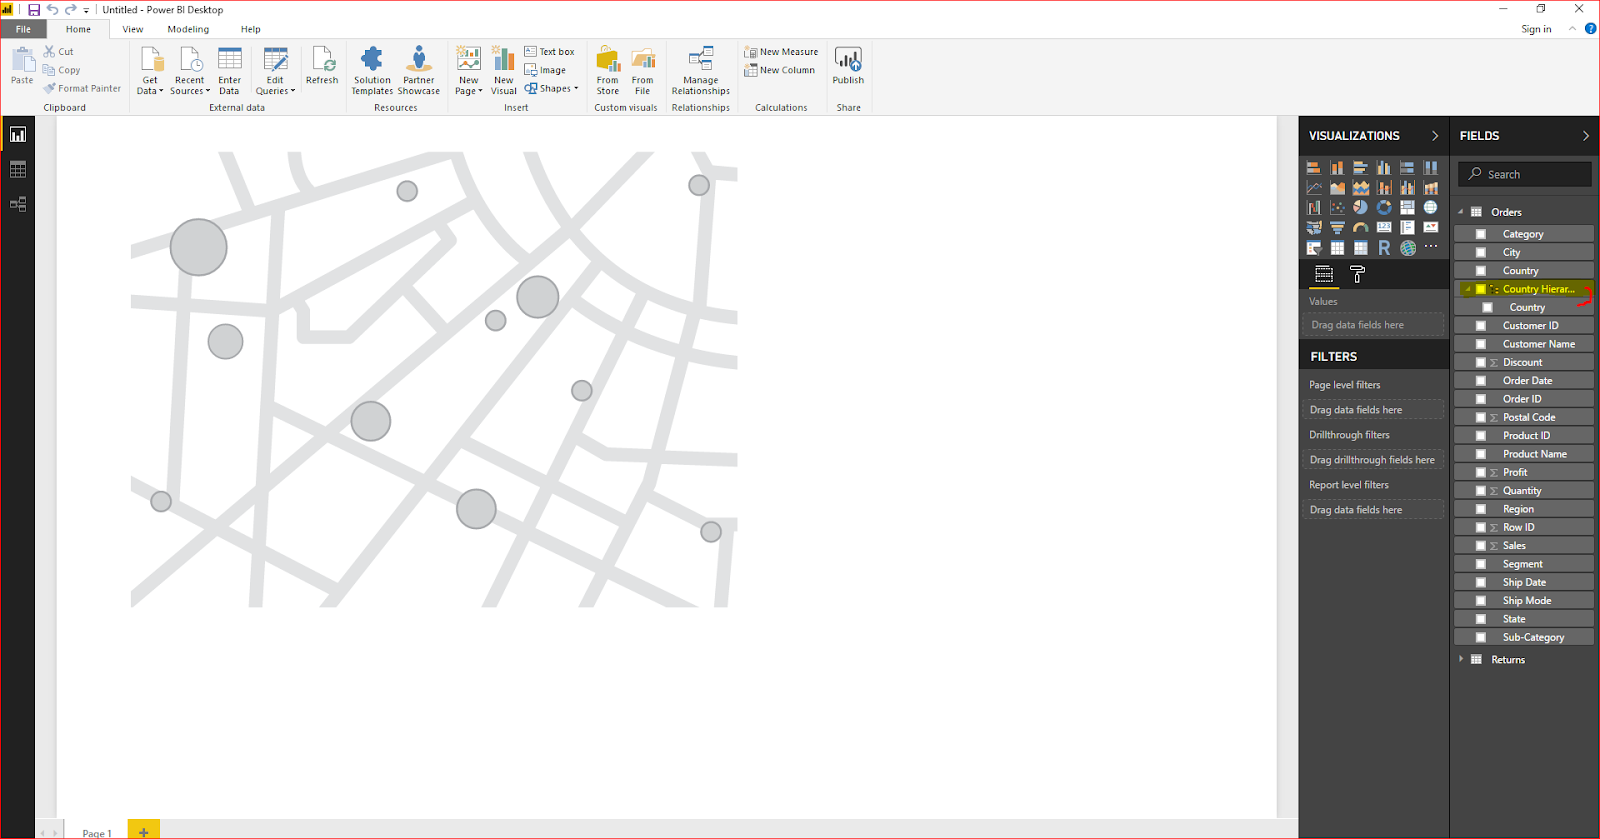 Maps & Hierarchy in Microsoft Power BI 32